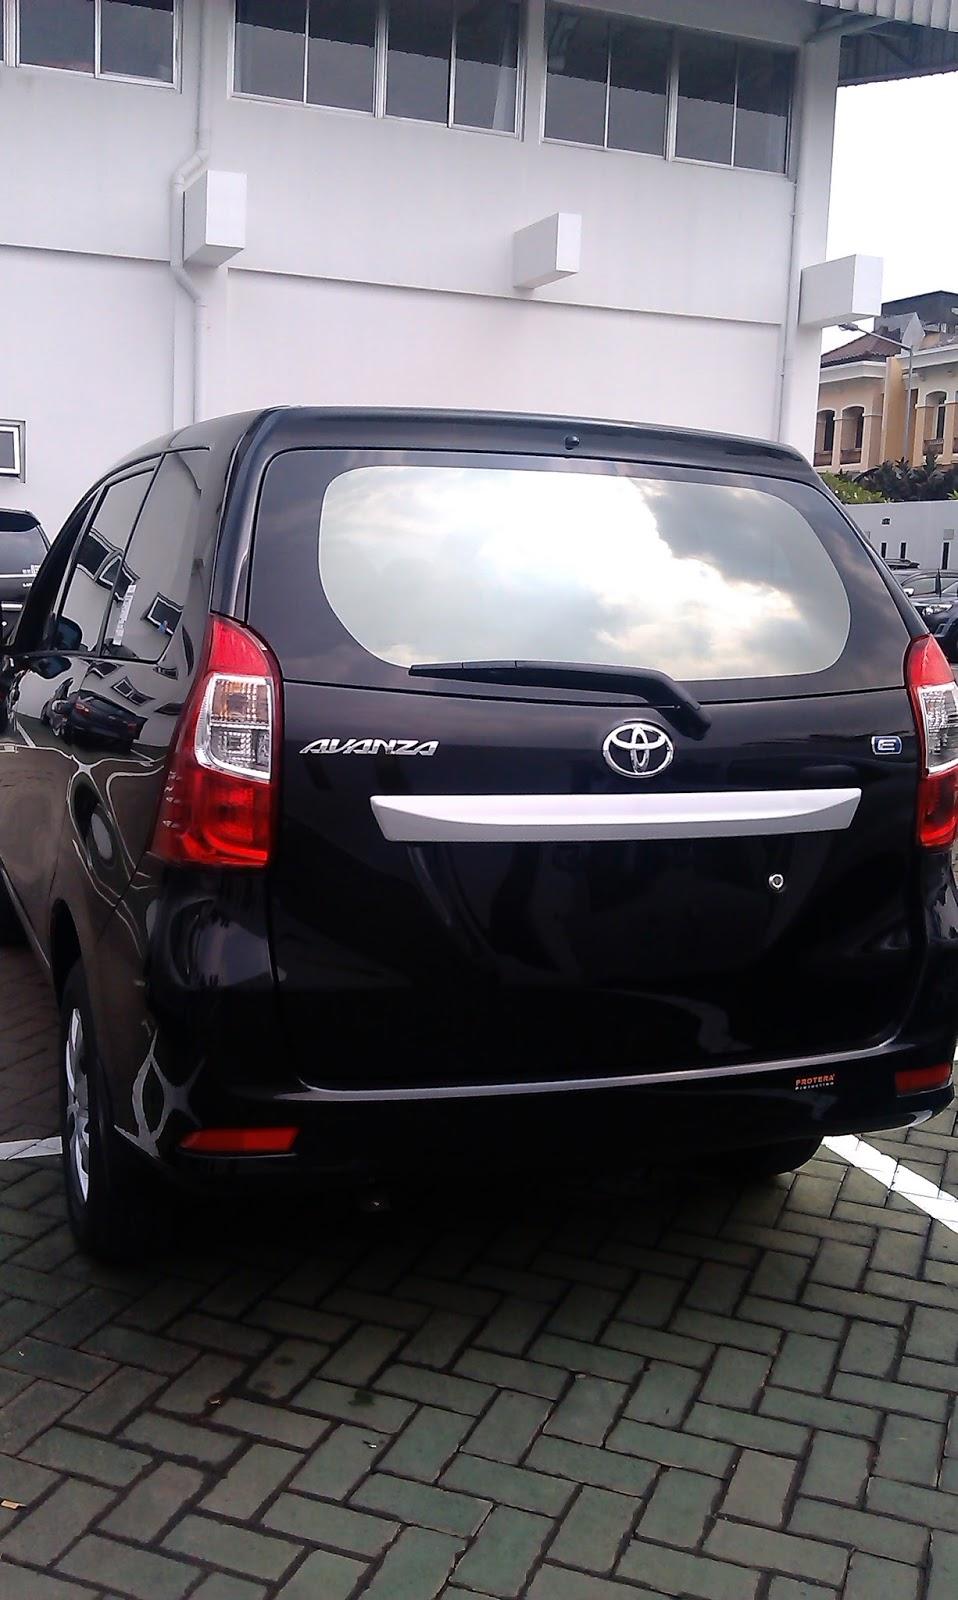 grand new avanza 2016 type e brand toyota camry price in nigeria facelift 2015 promosi telp 085211911125 089622829224 whatsapp semoga informasi mengenai bisa memberikan manfaat